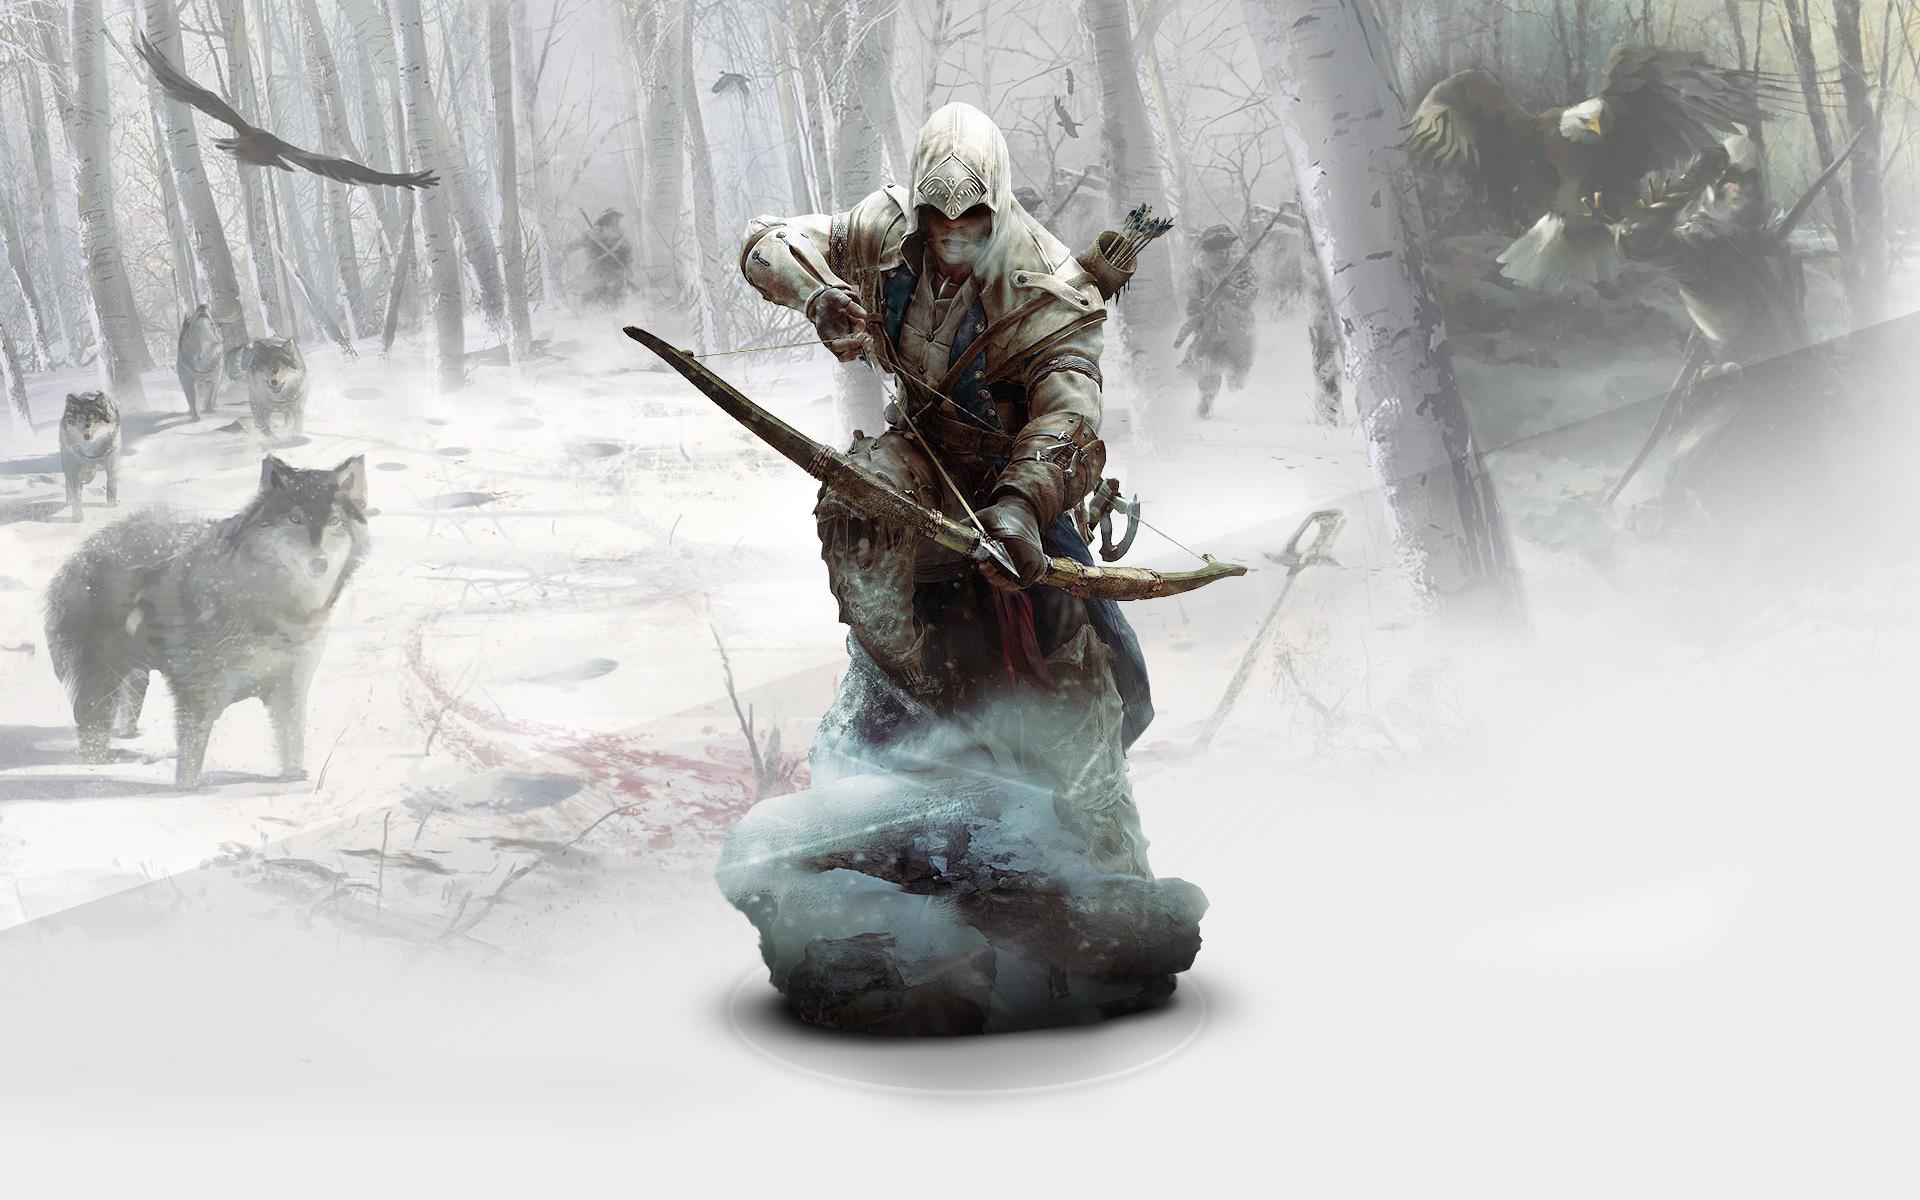 Ratonhnhaketon Assassins Creed 3 Hd Wallpaper